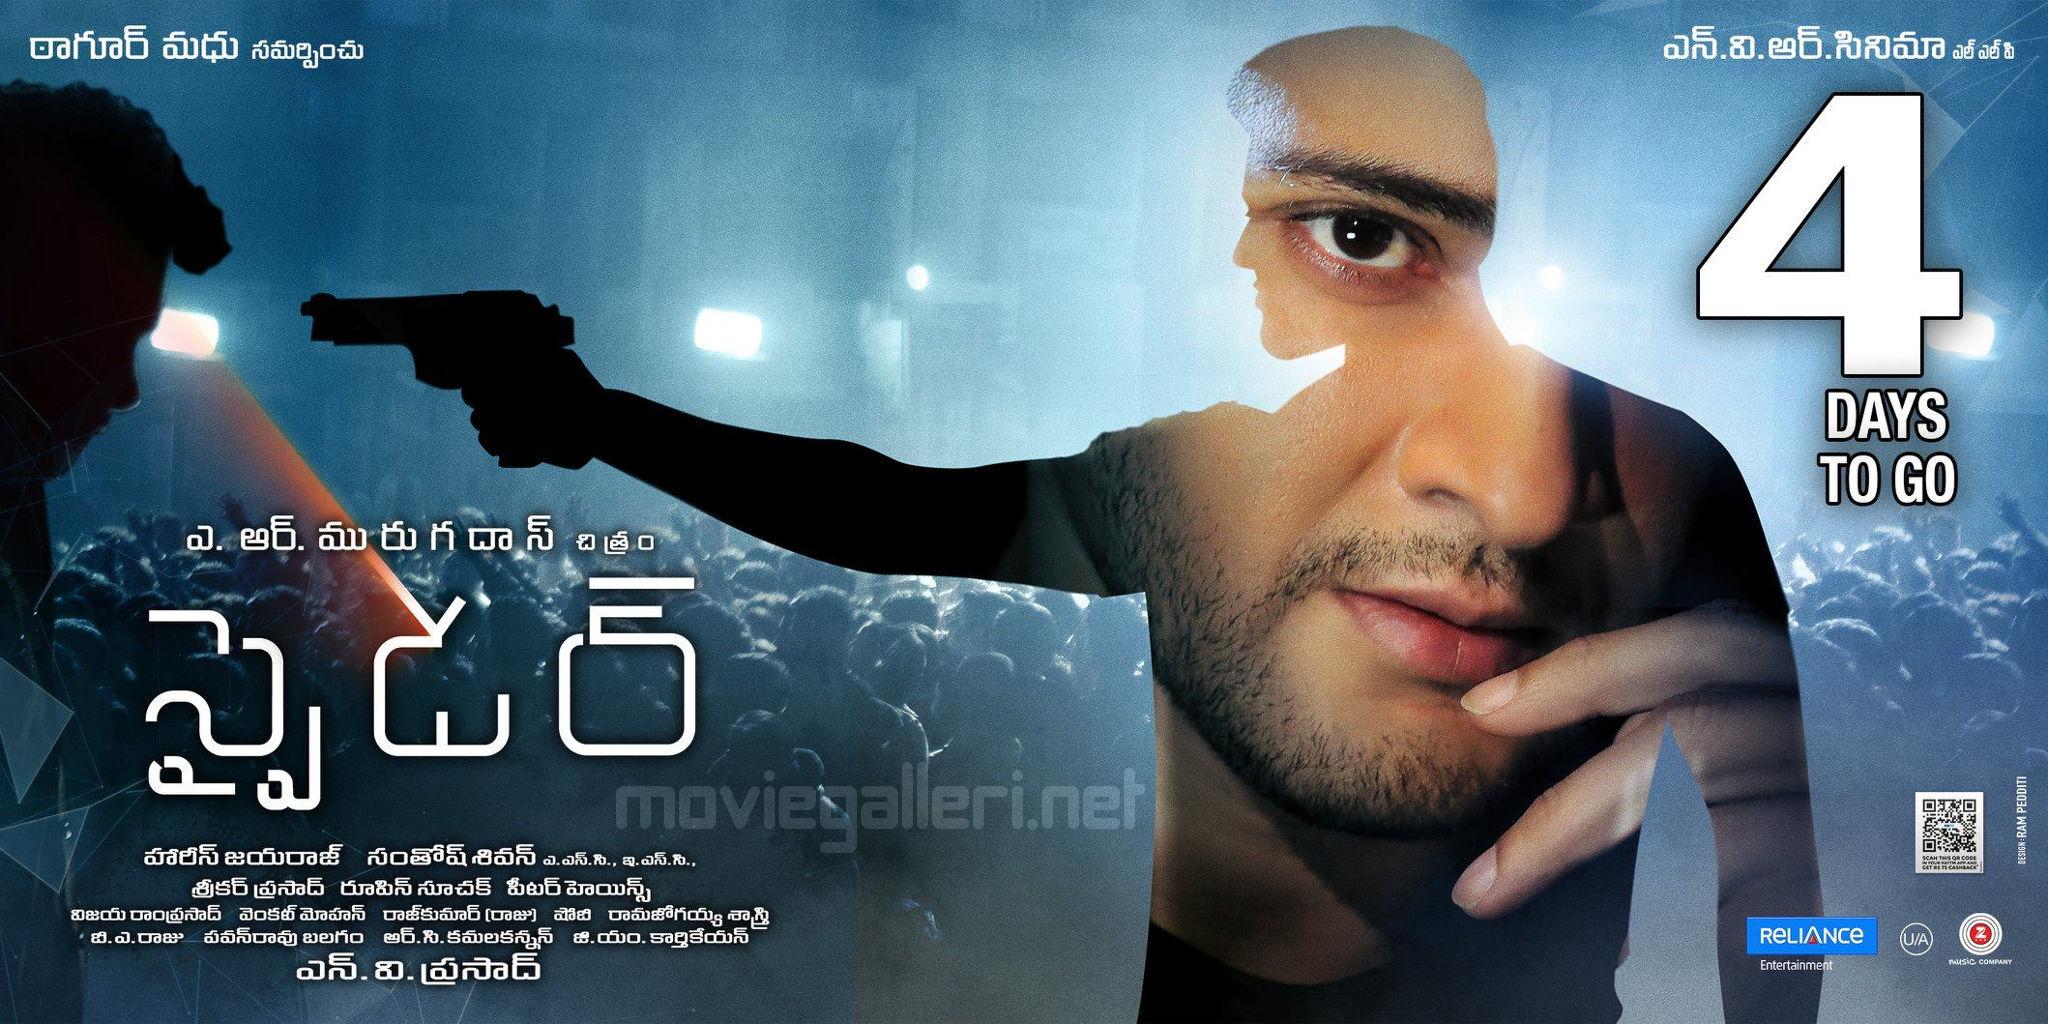 mahesh babu spyder 4 days to go wallpapers new movie posters mahesh babu spyder 4 days to go